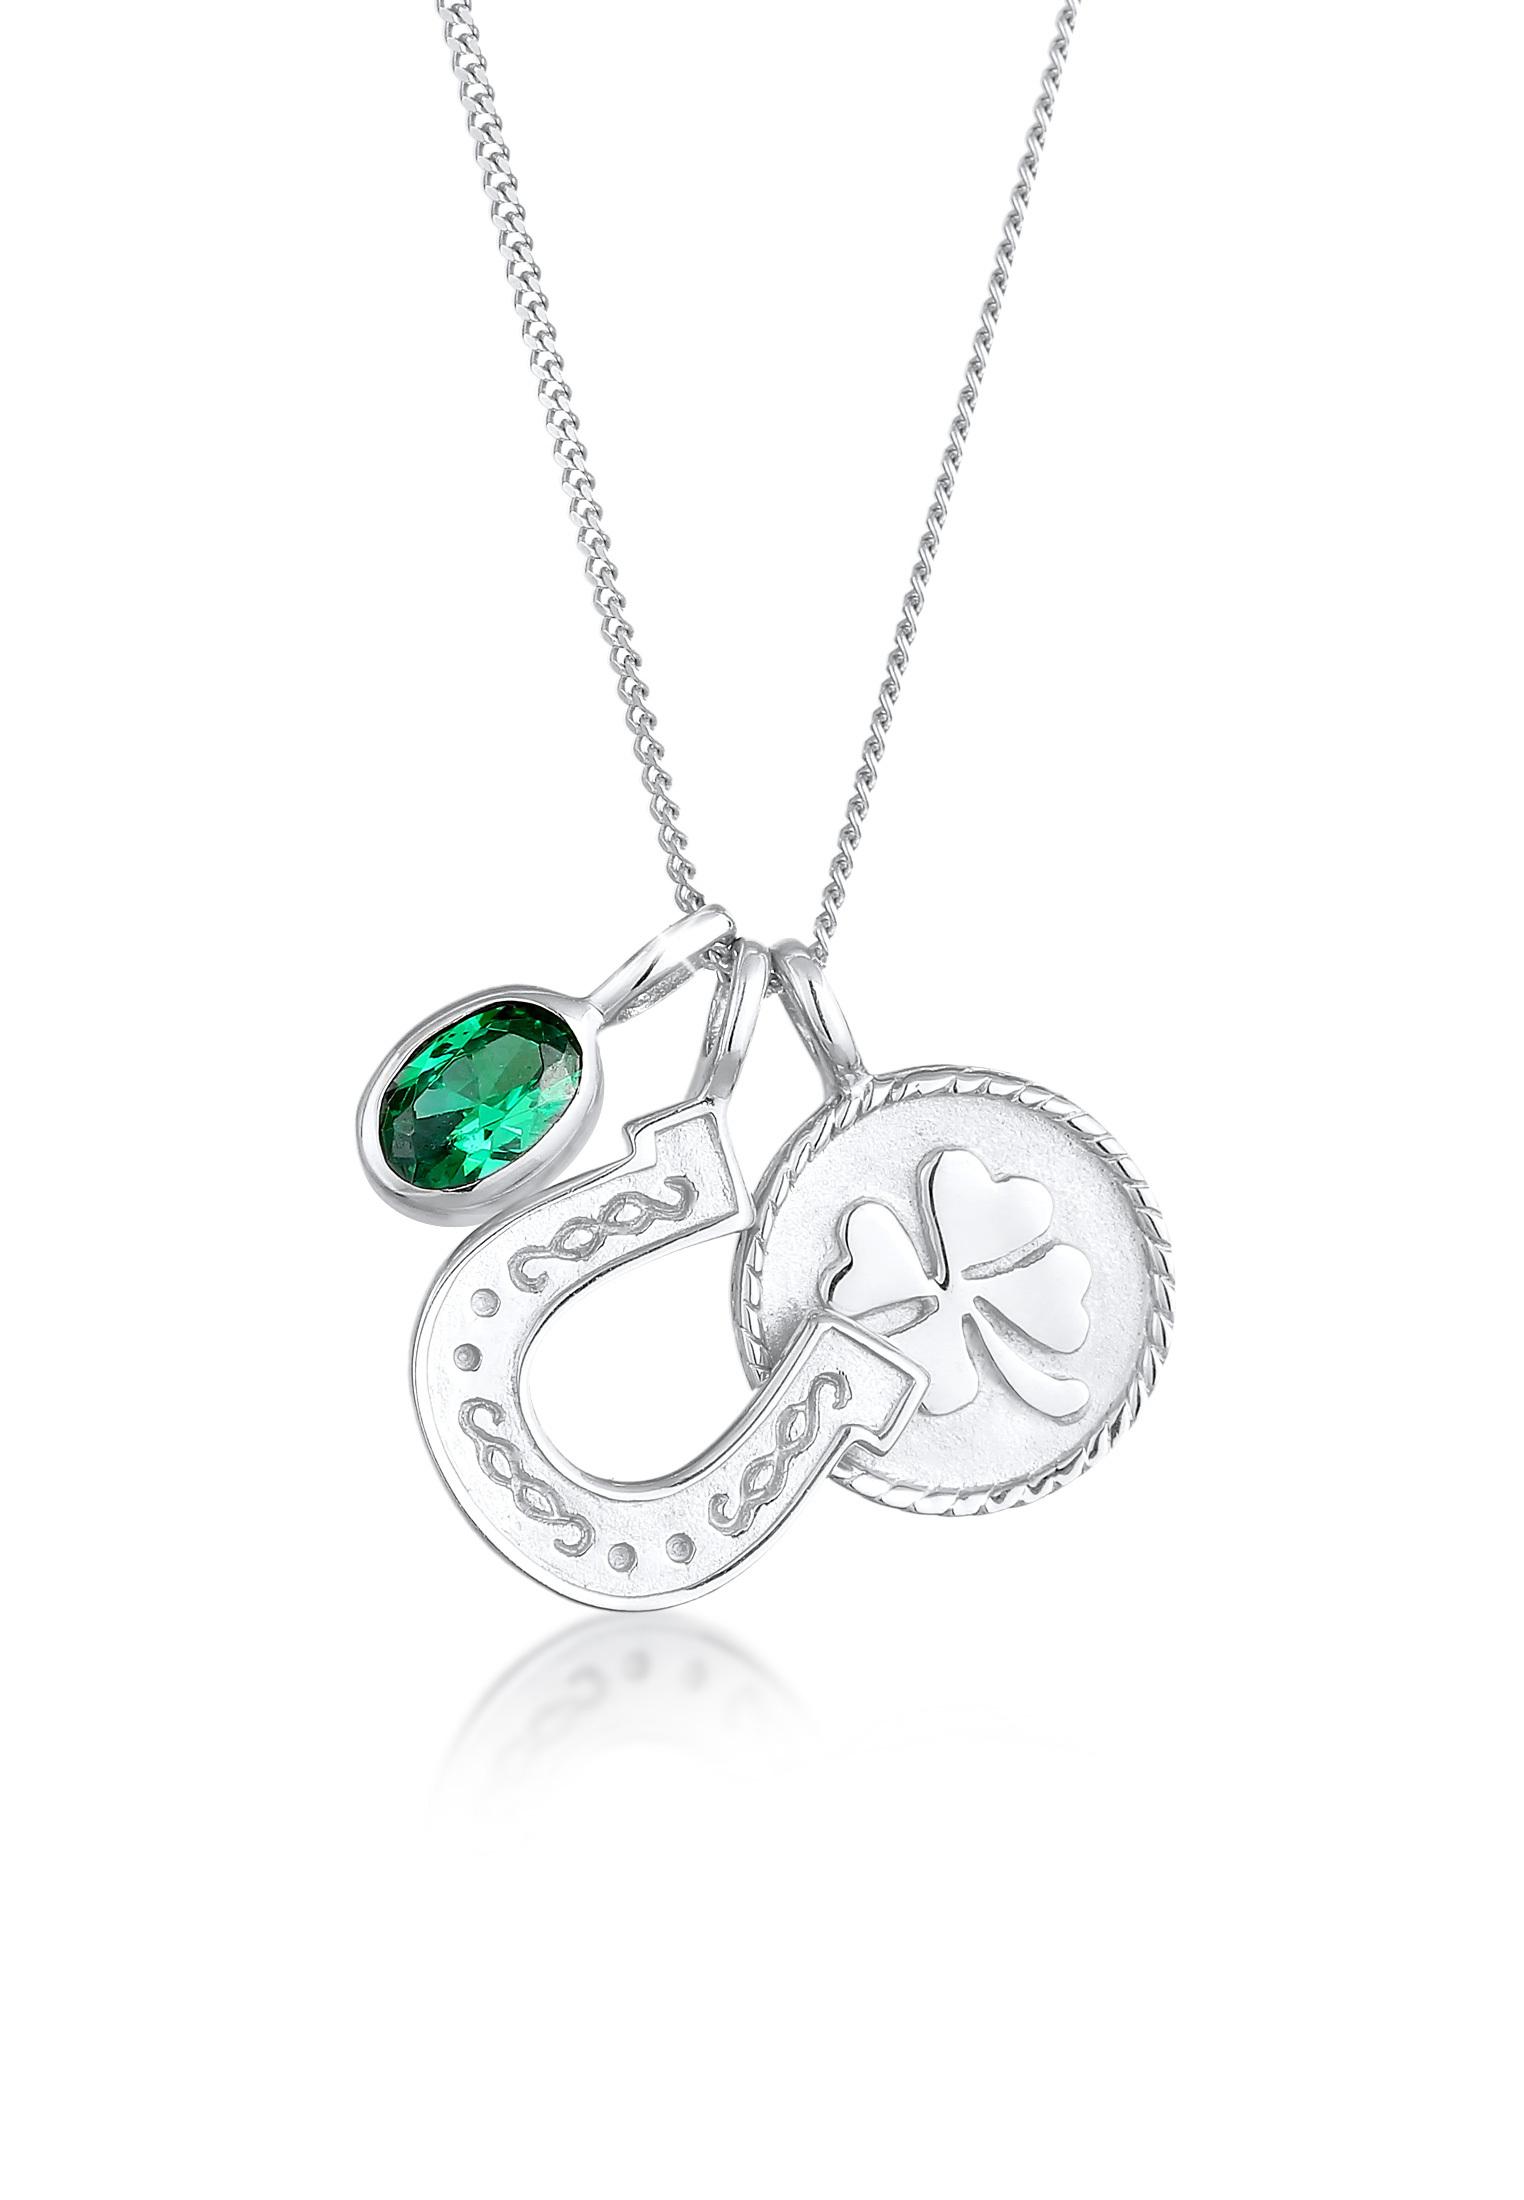 Halskette Talisman | Zirkonia (grün) | 925er Sterling Silber